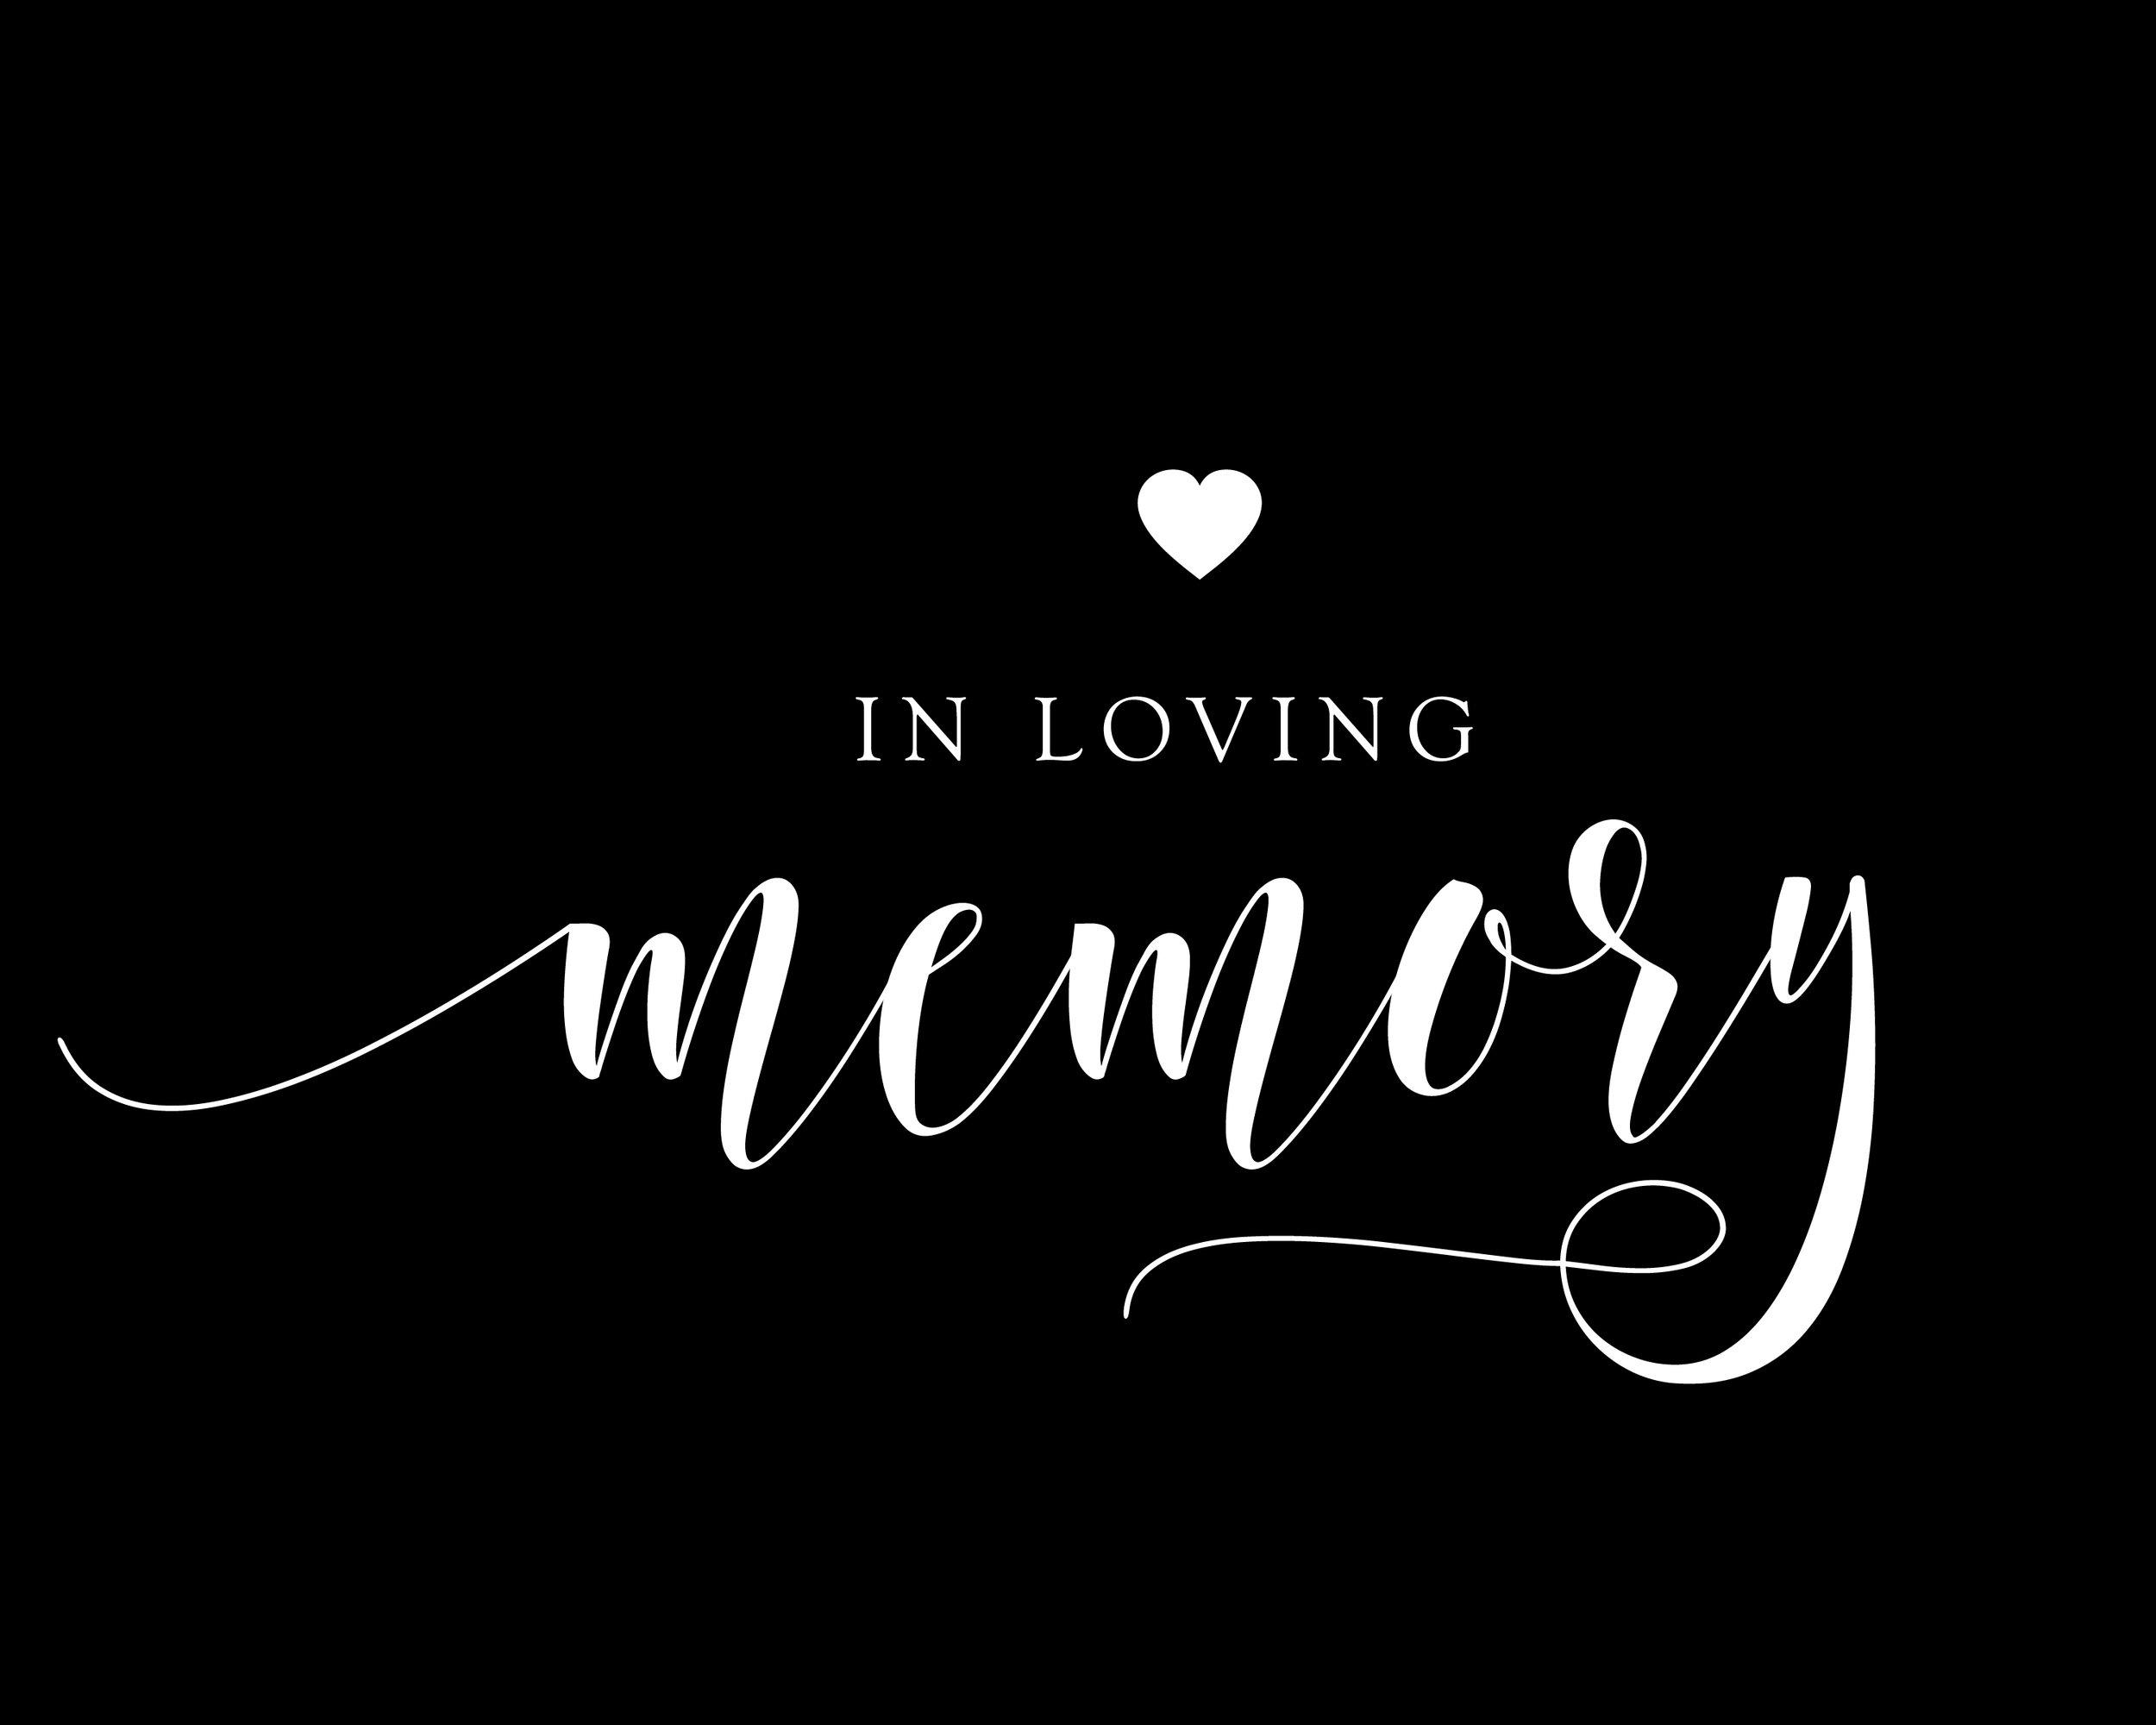 Im Memoriam for Billy Dale King    From Carla & David Letassy and Nancy Abernathy